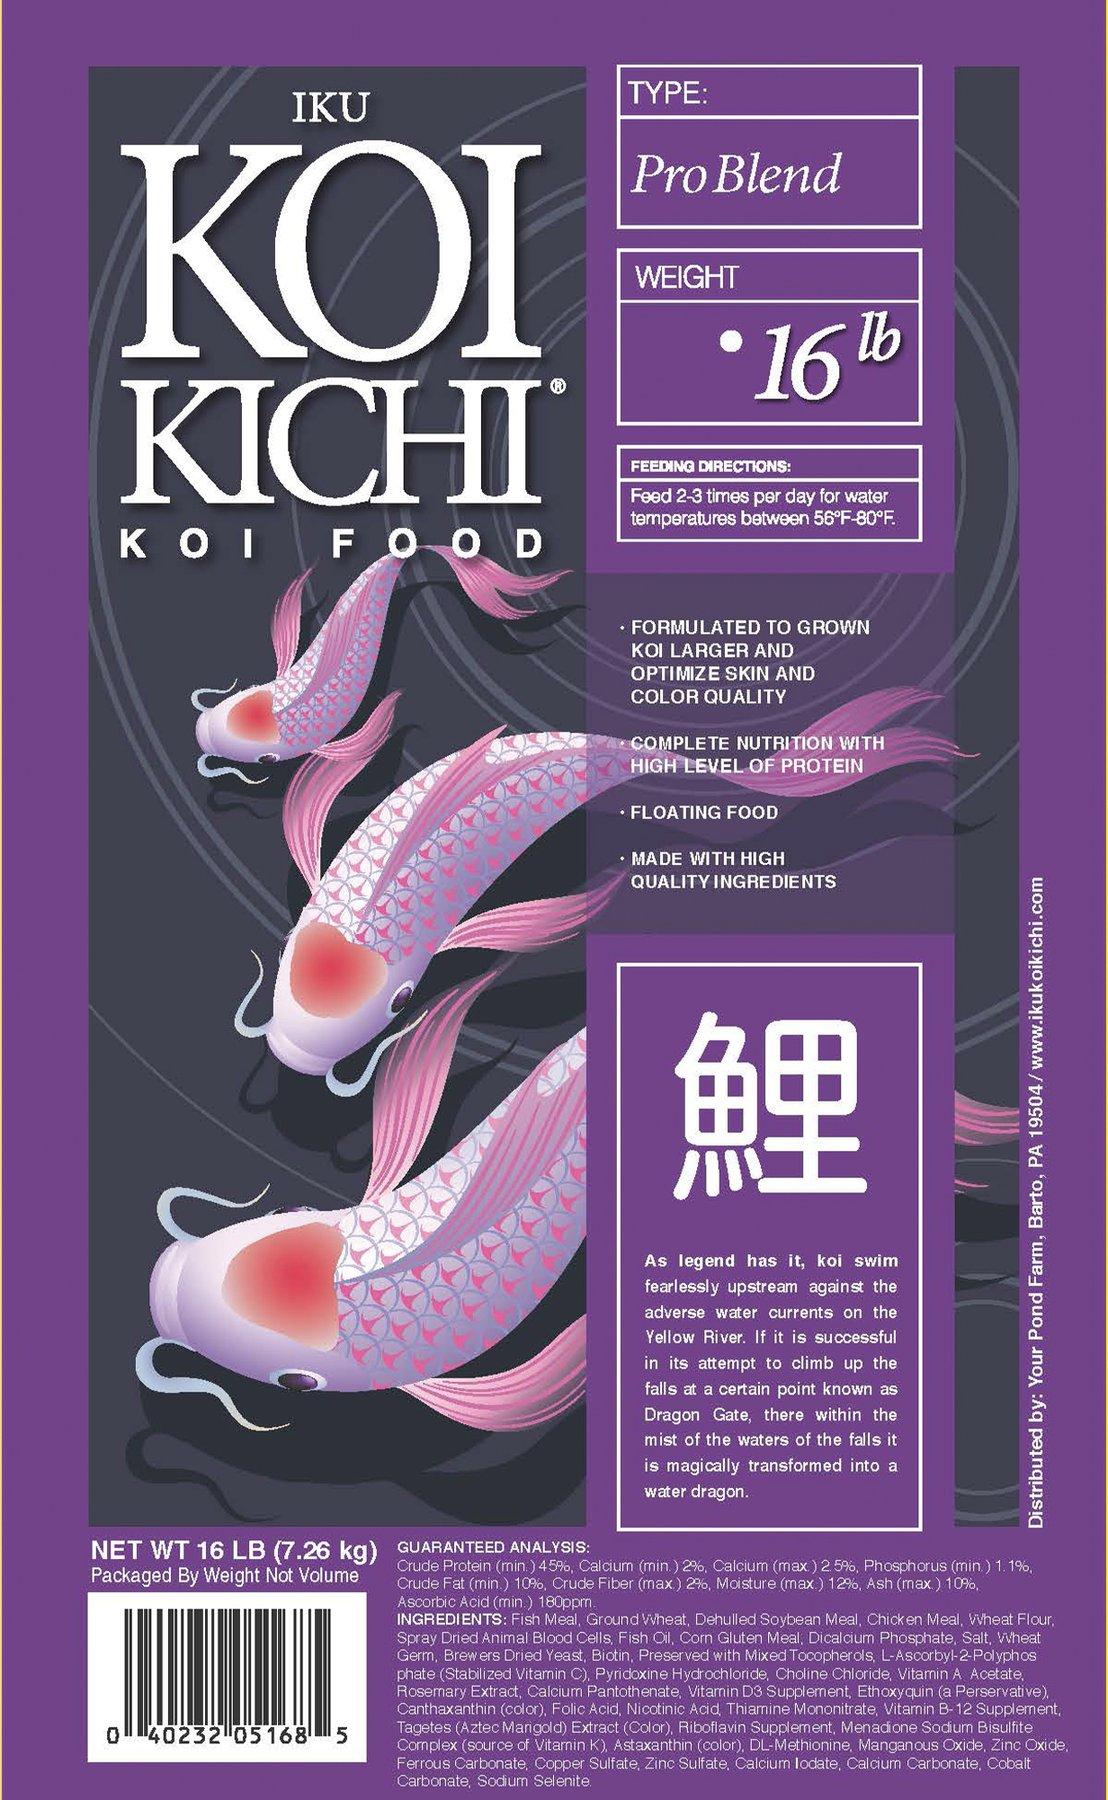 Iku Koi Kichi Pro Blend Koi Fish Food - 40 lbs.